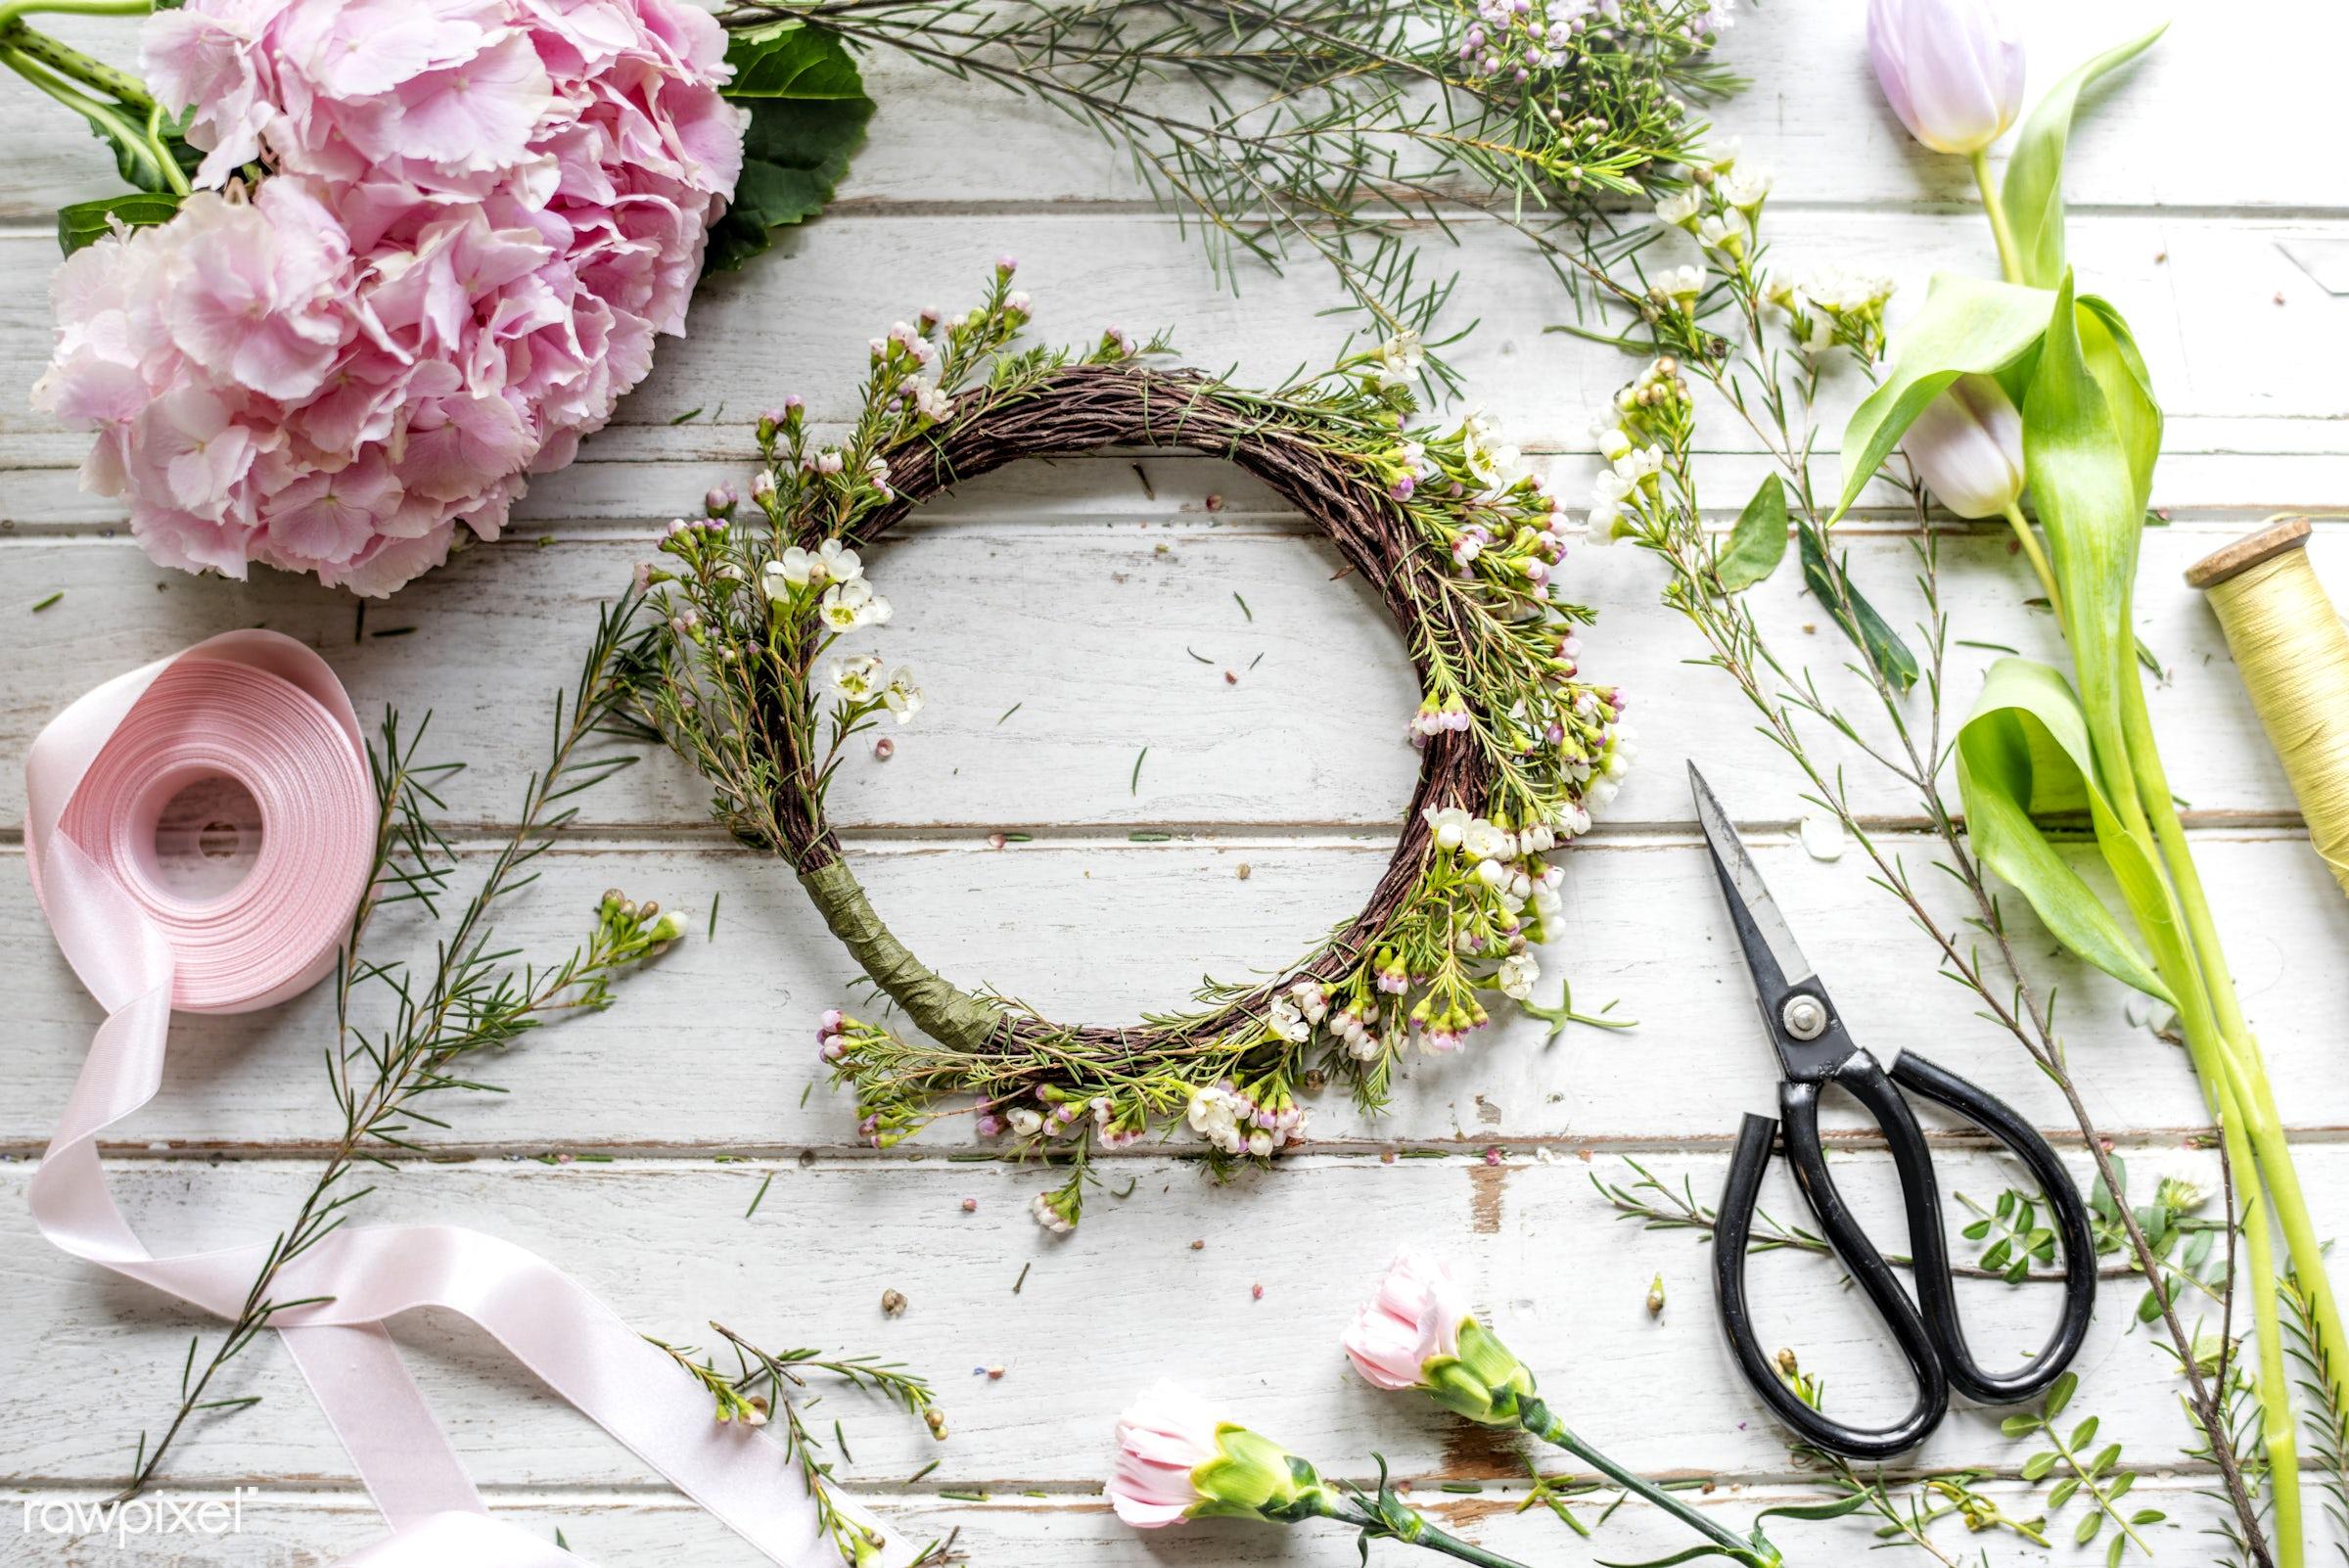 festive, shop, detail, decorative, colorful, events, plants, spring, blossom, wax flower, decor, nature, fresh, attractive,...